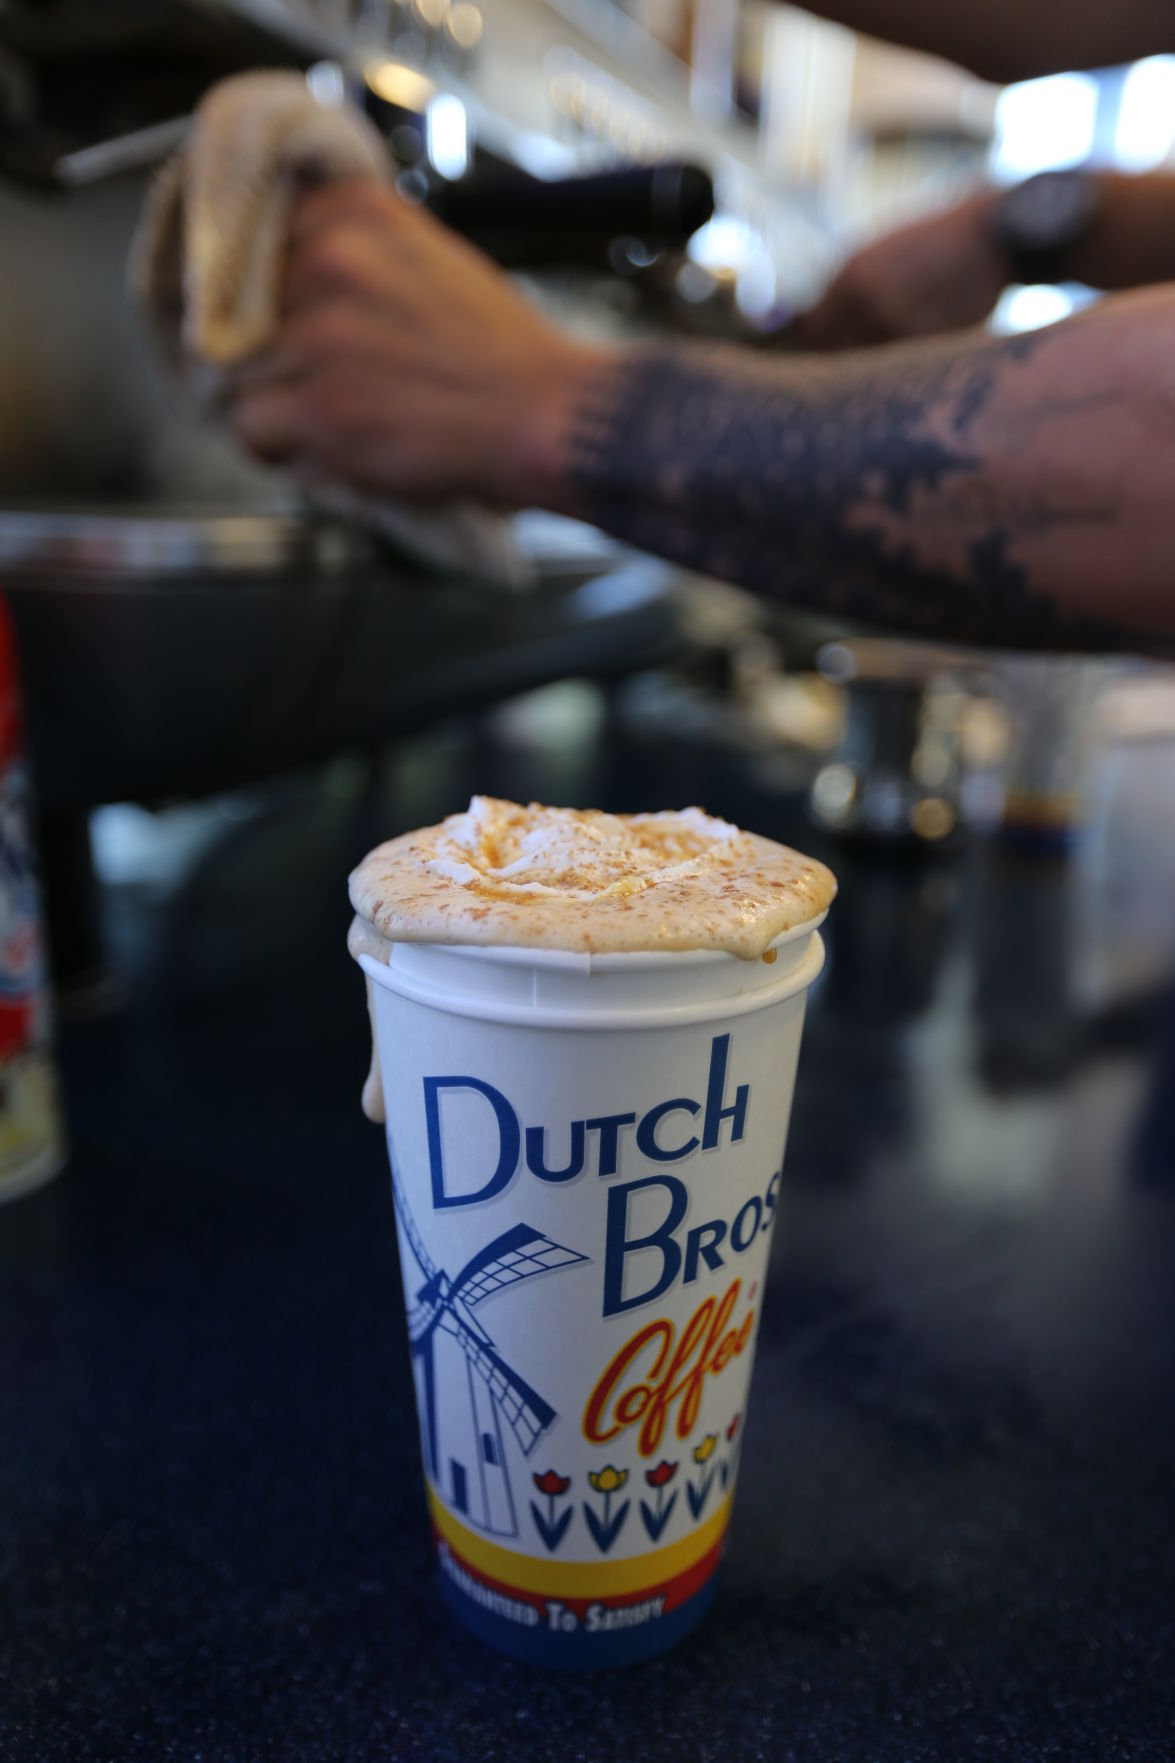 Pumpkin Coffee Drinks Offer Jump Start On Holiday Weight Gain Health Bendbulletin Com